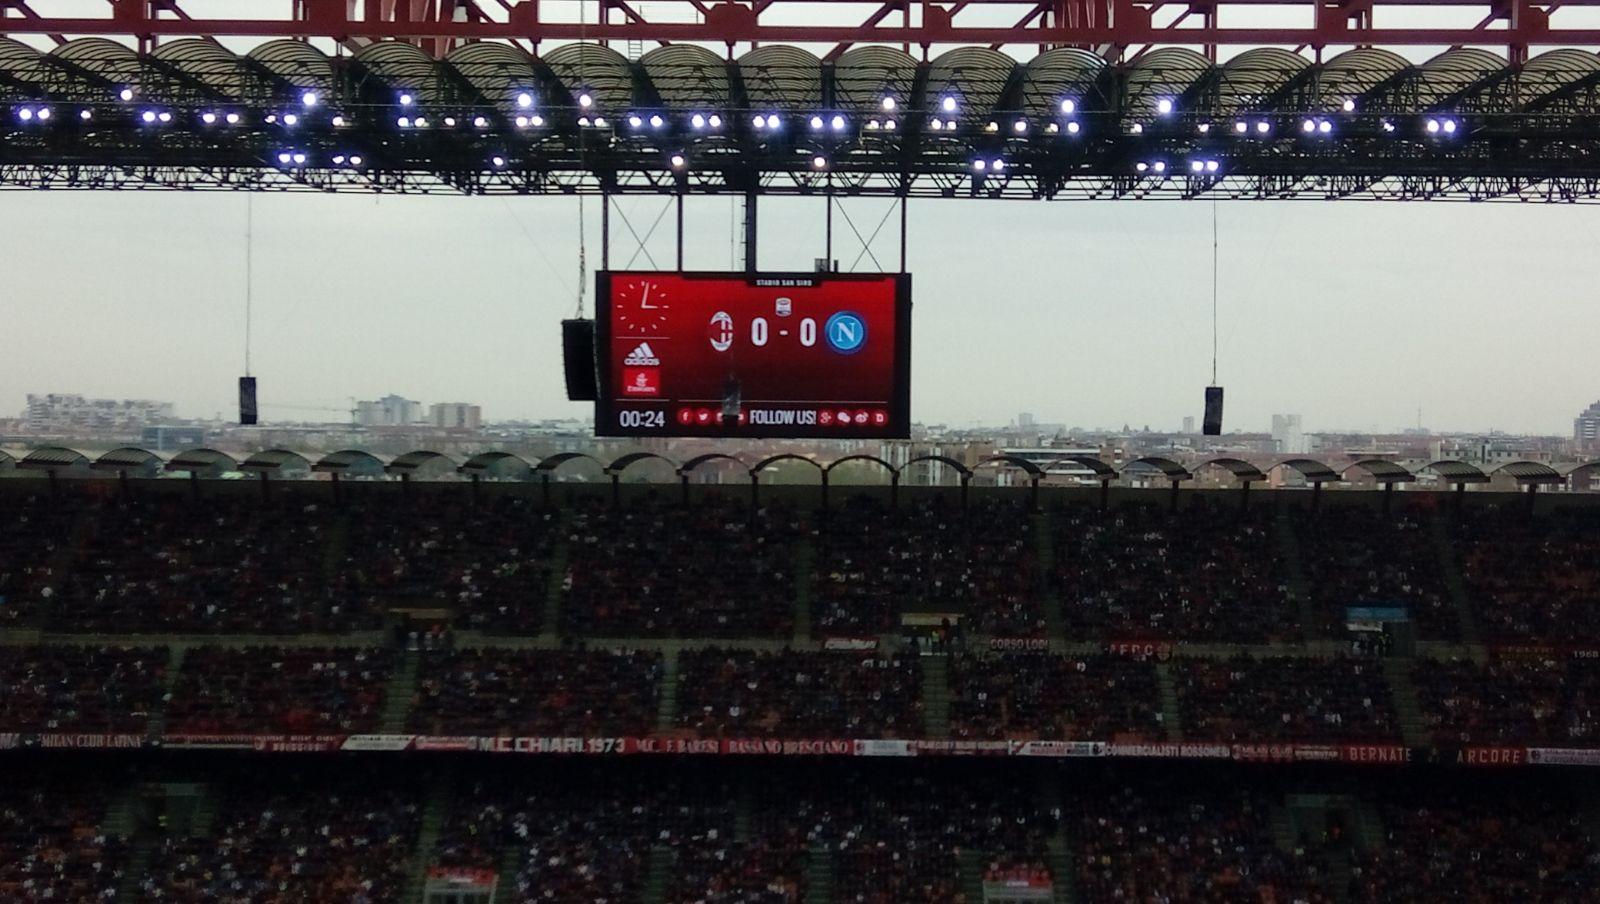 milan-napoli stadiosport